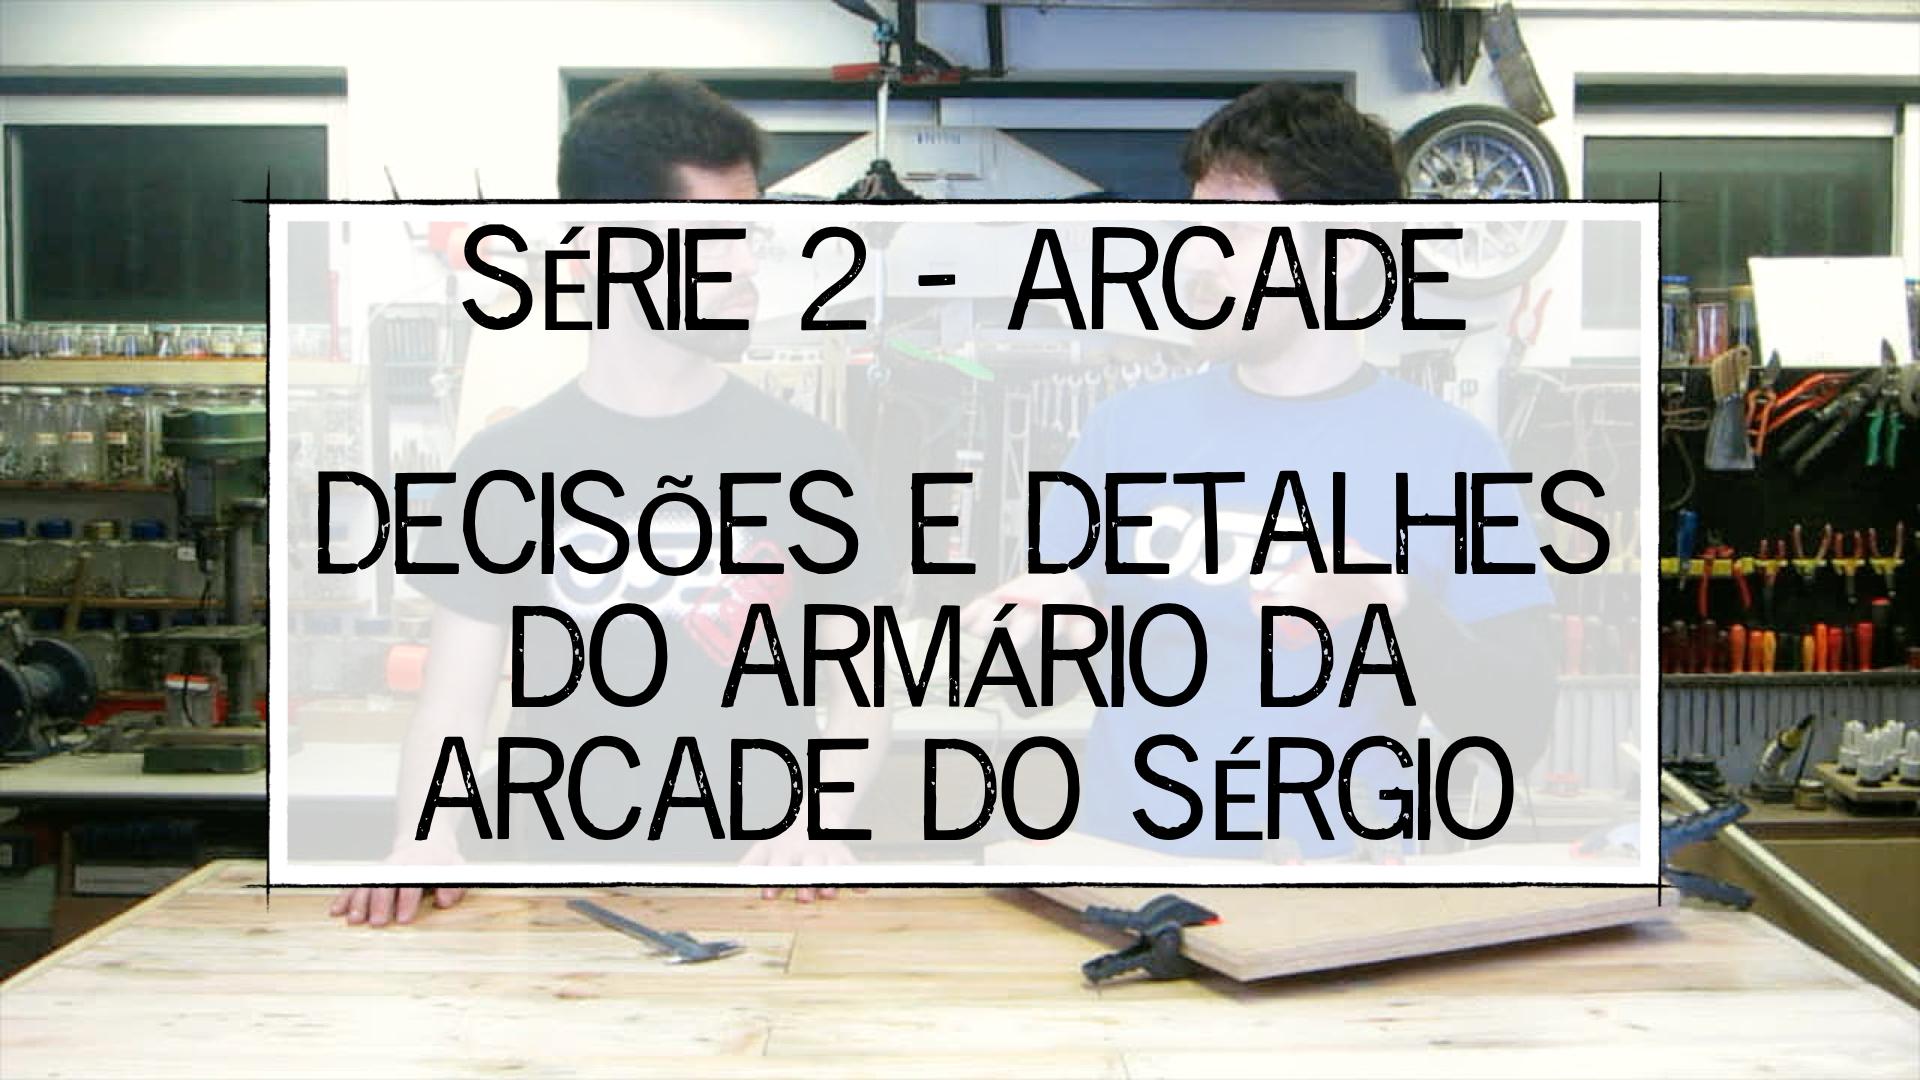 OOZ_Labs_-_S02E03_-_Decisoes_e_Detalhes_do_Armario_da_Arcade_do_Sergio_-_Thumb